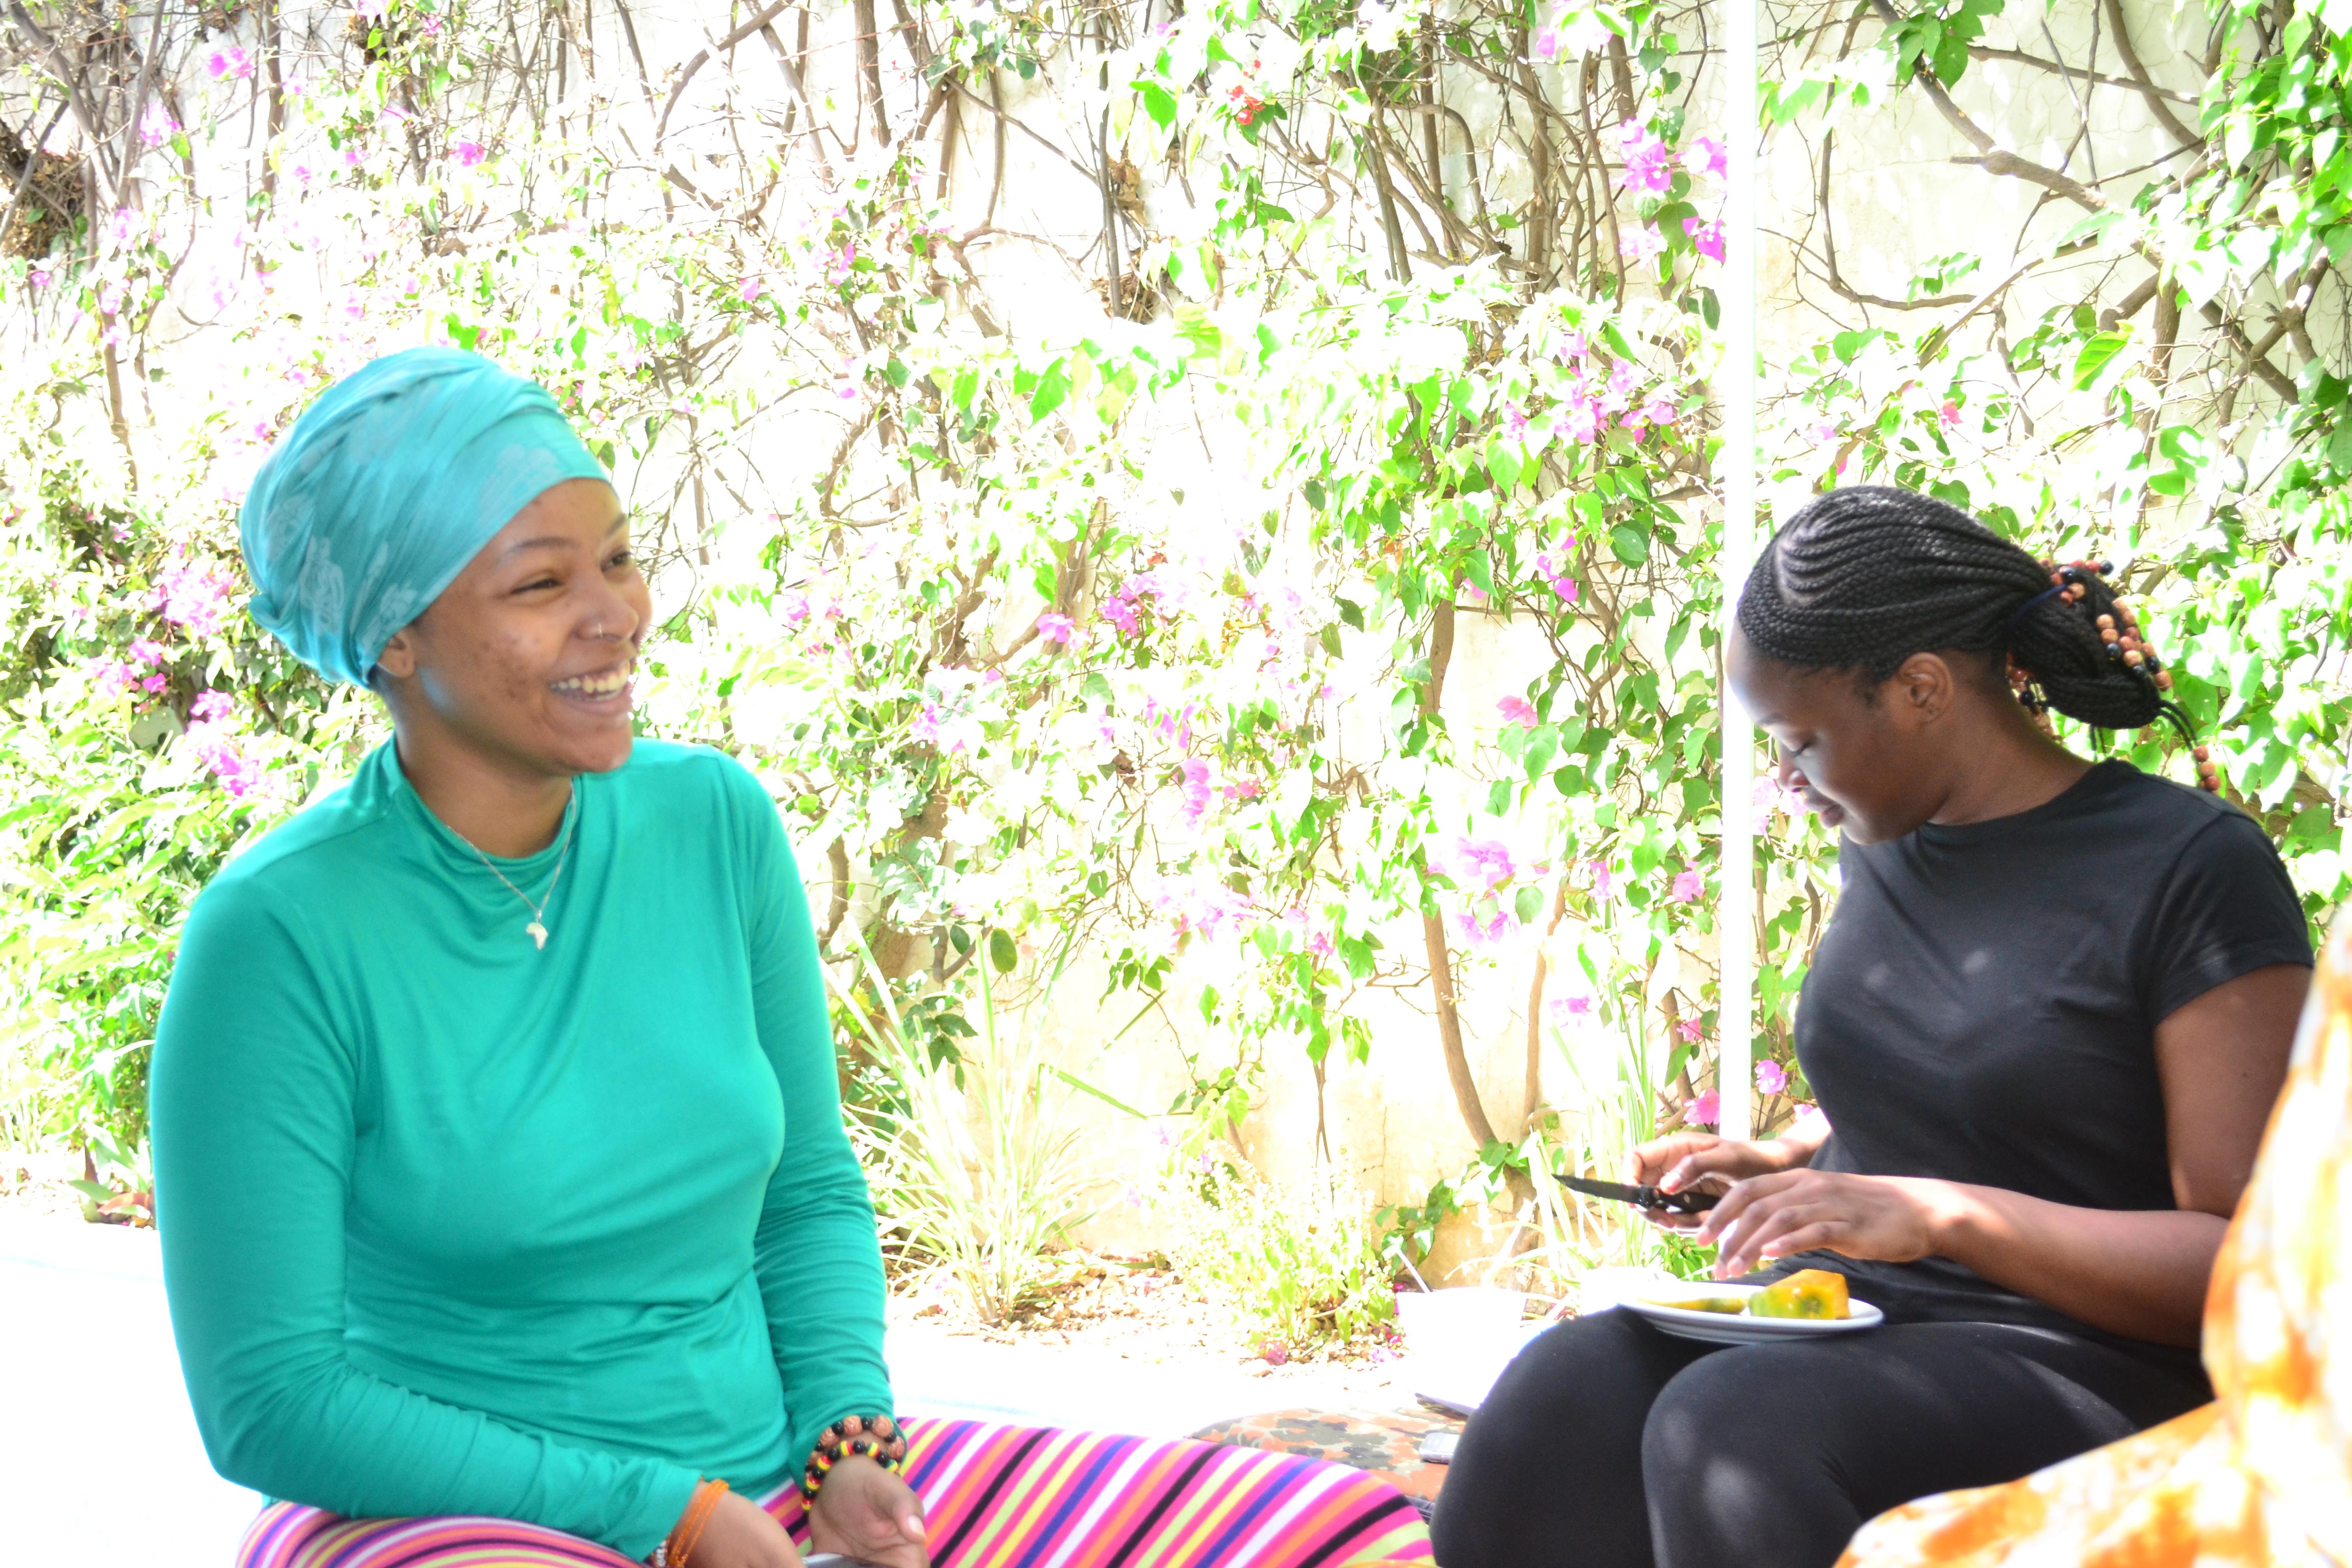 we-sisterhood-2017-dakar-13-bilan-femmes-noires-rires